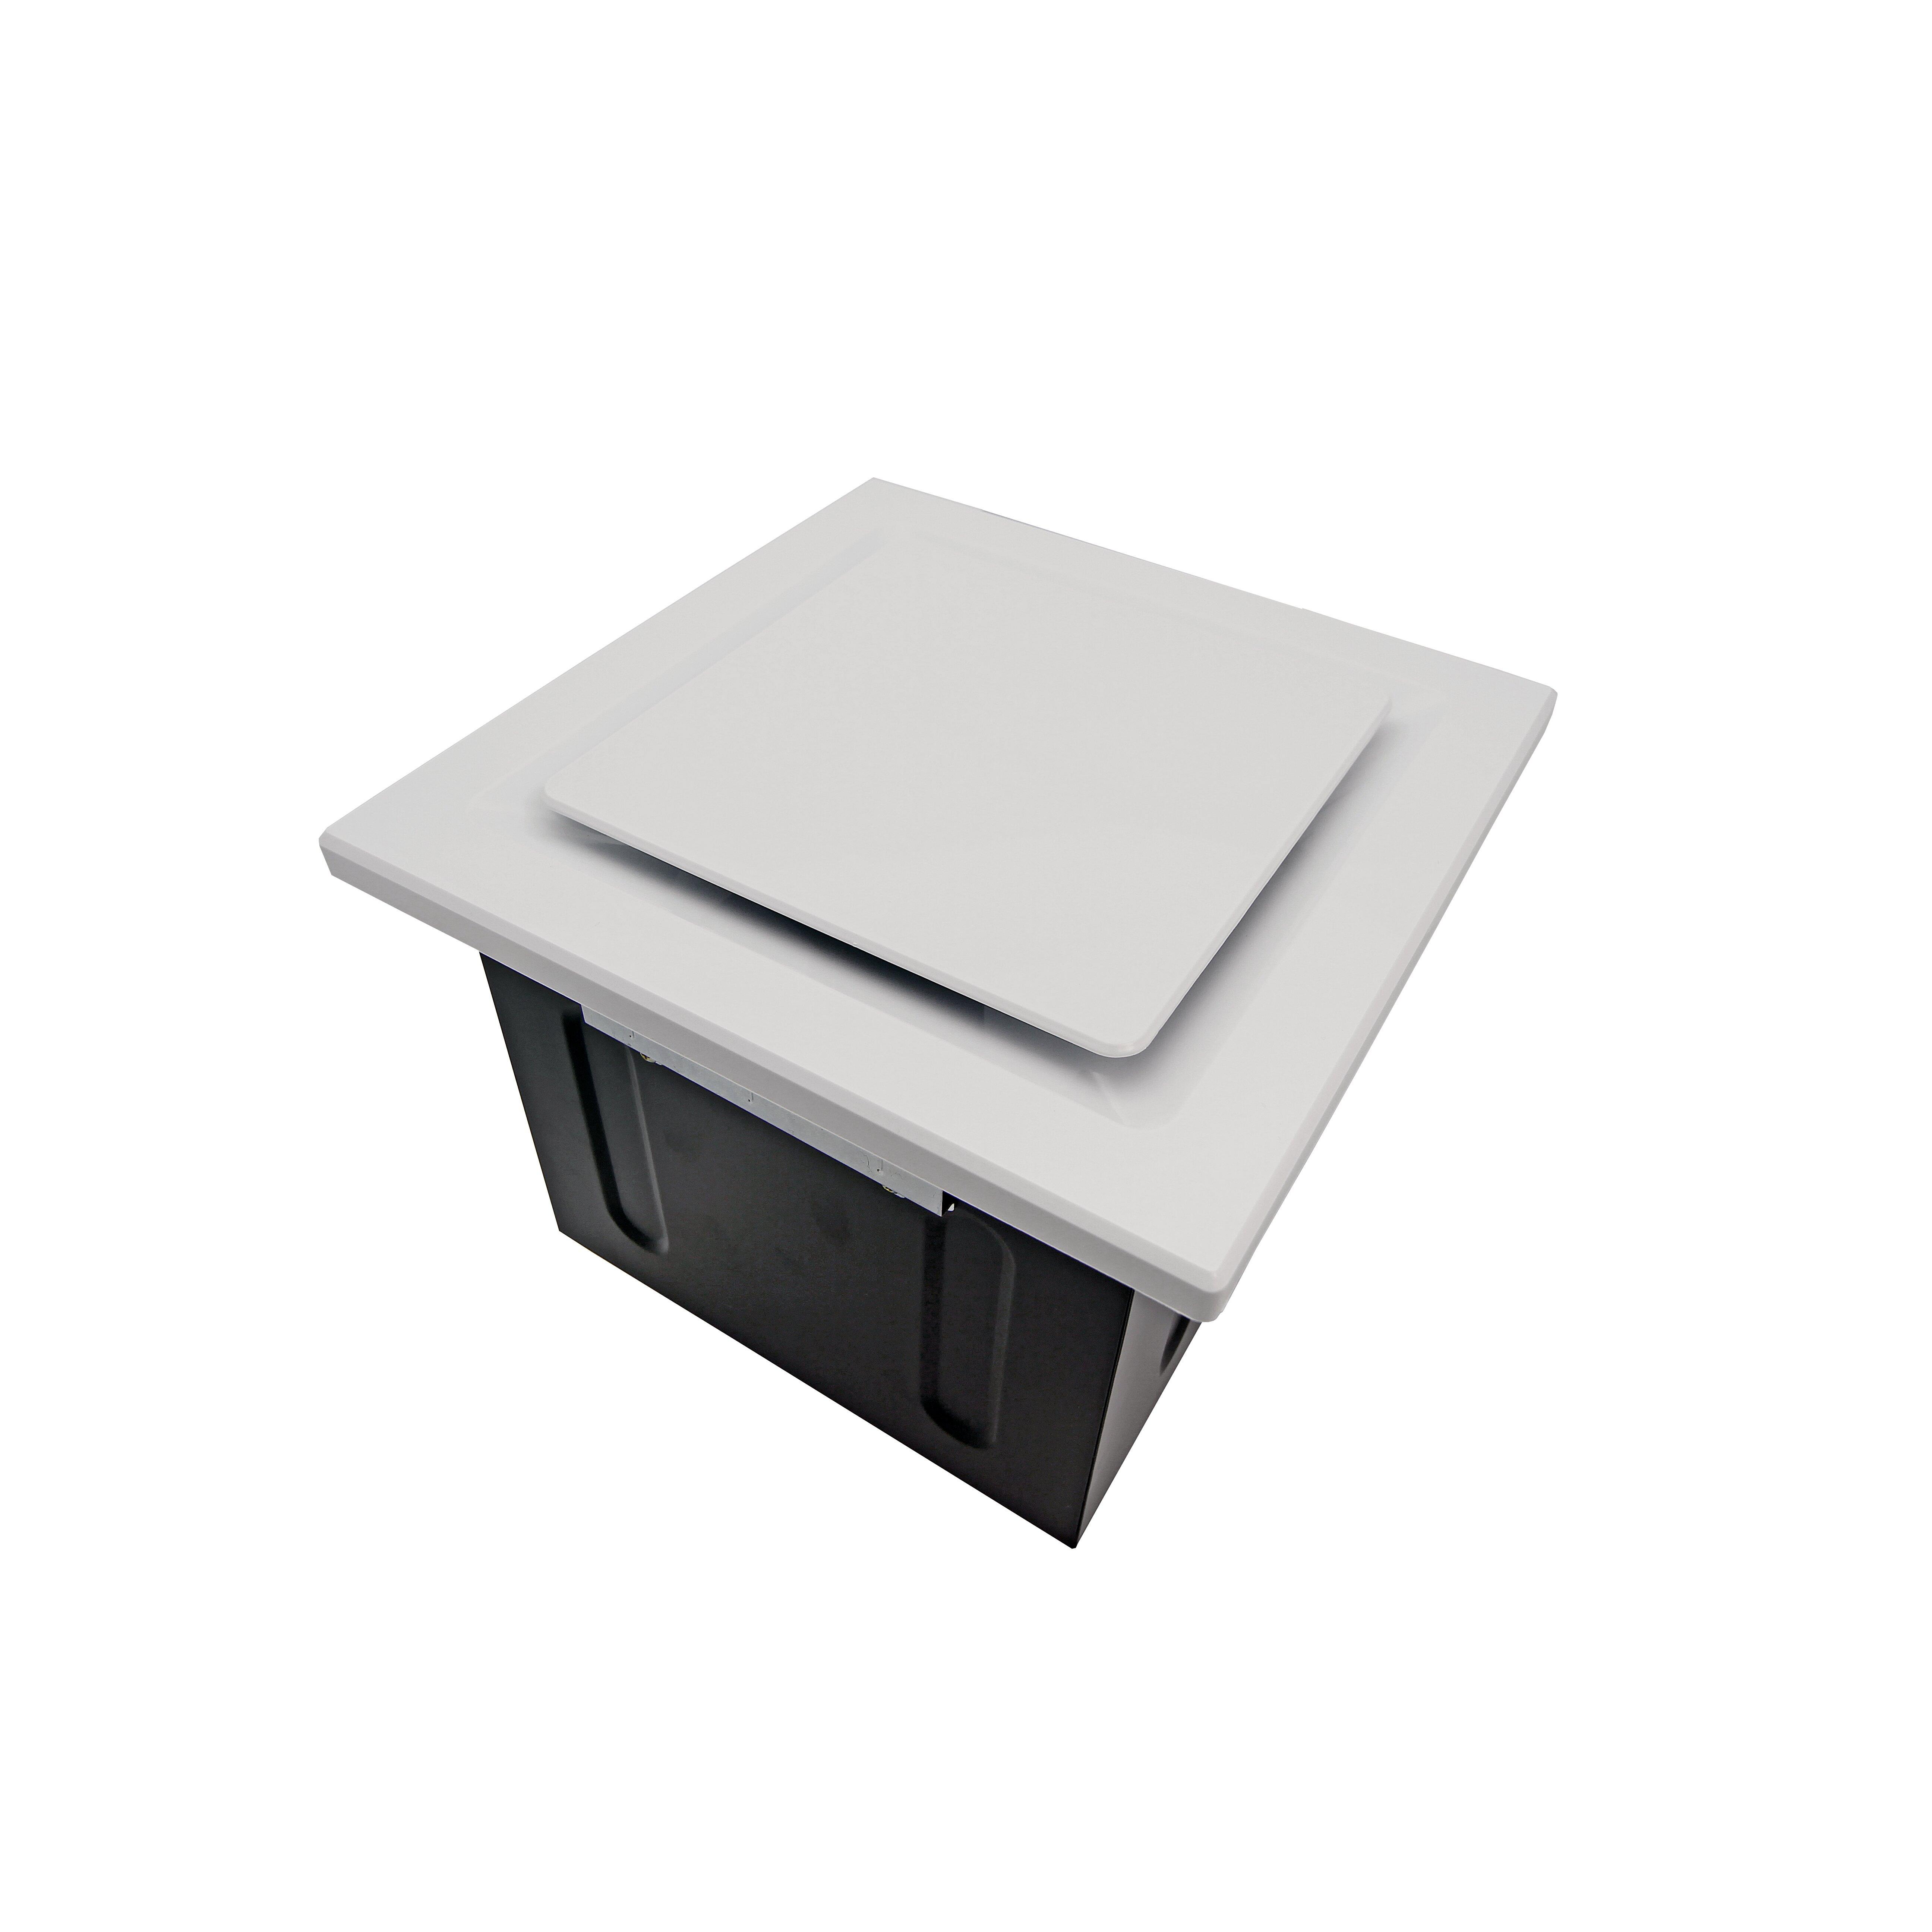 Quietest bathroom exhaust fan - Quick View Super Quiet 80 Cfm Bathroom Ventilation Fan